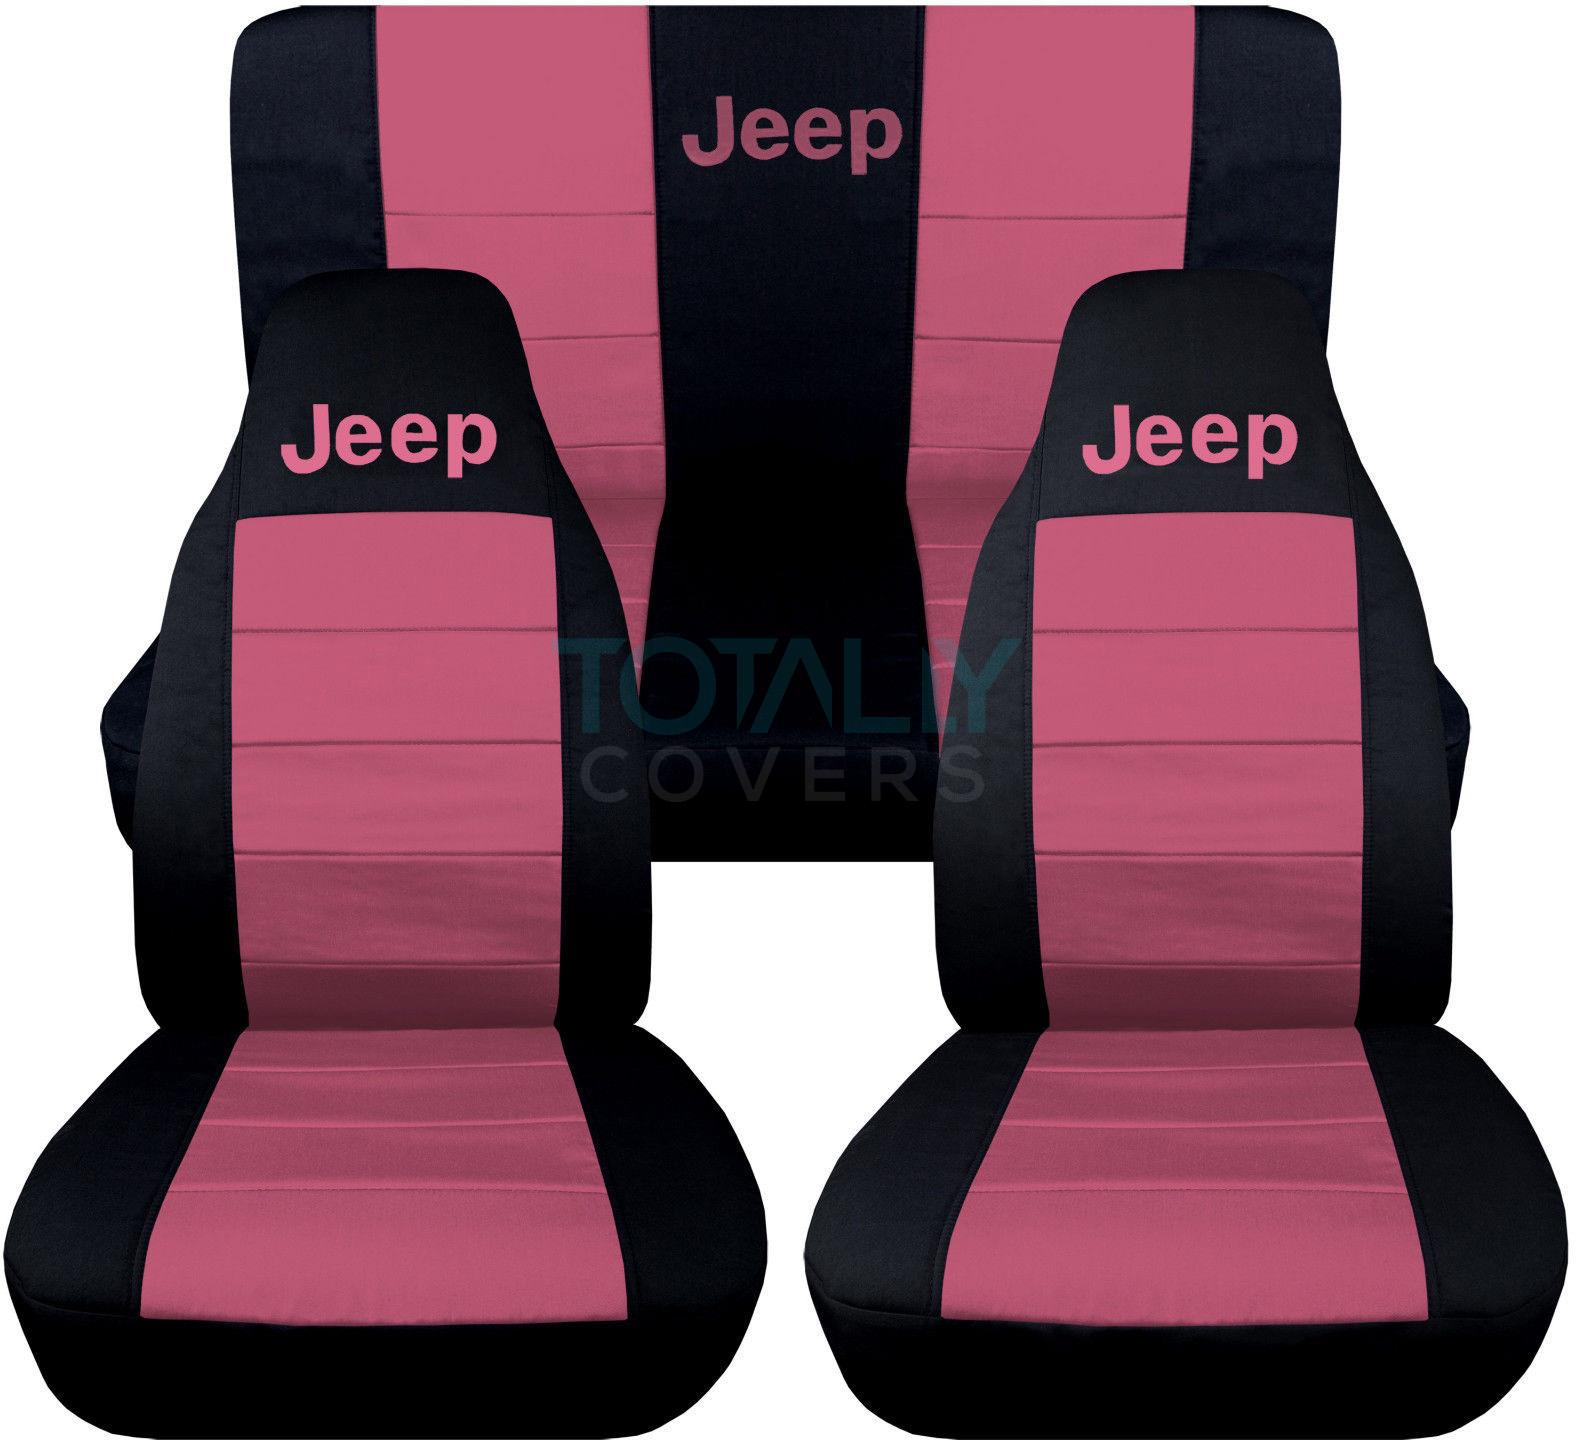 Jeep Wrangler YJ TJ JK 1987 2017 2 Tone Seat Covers W Logo